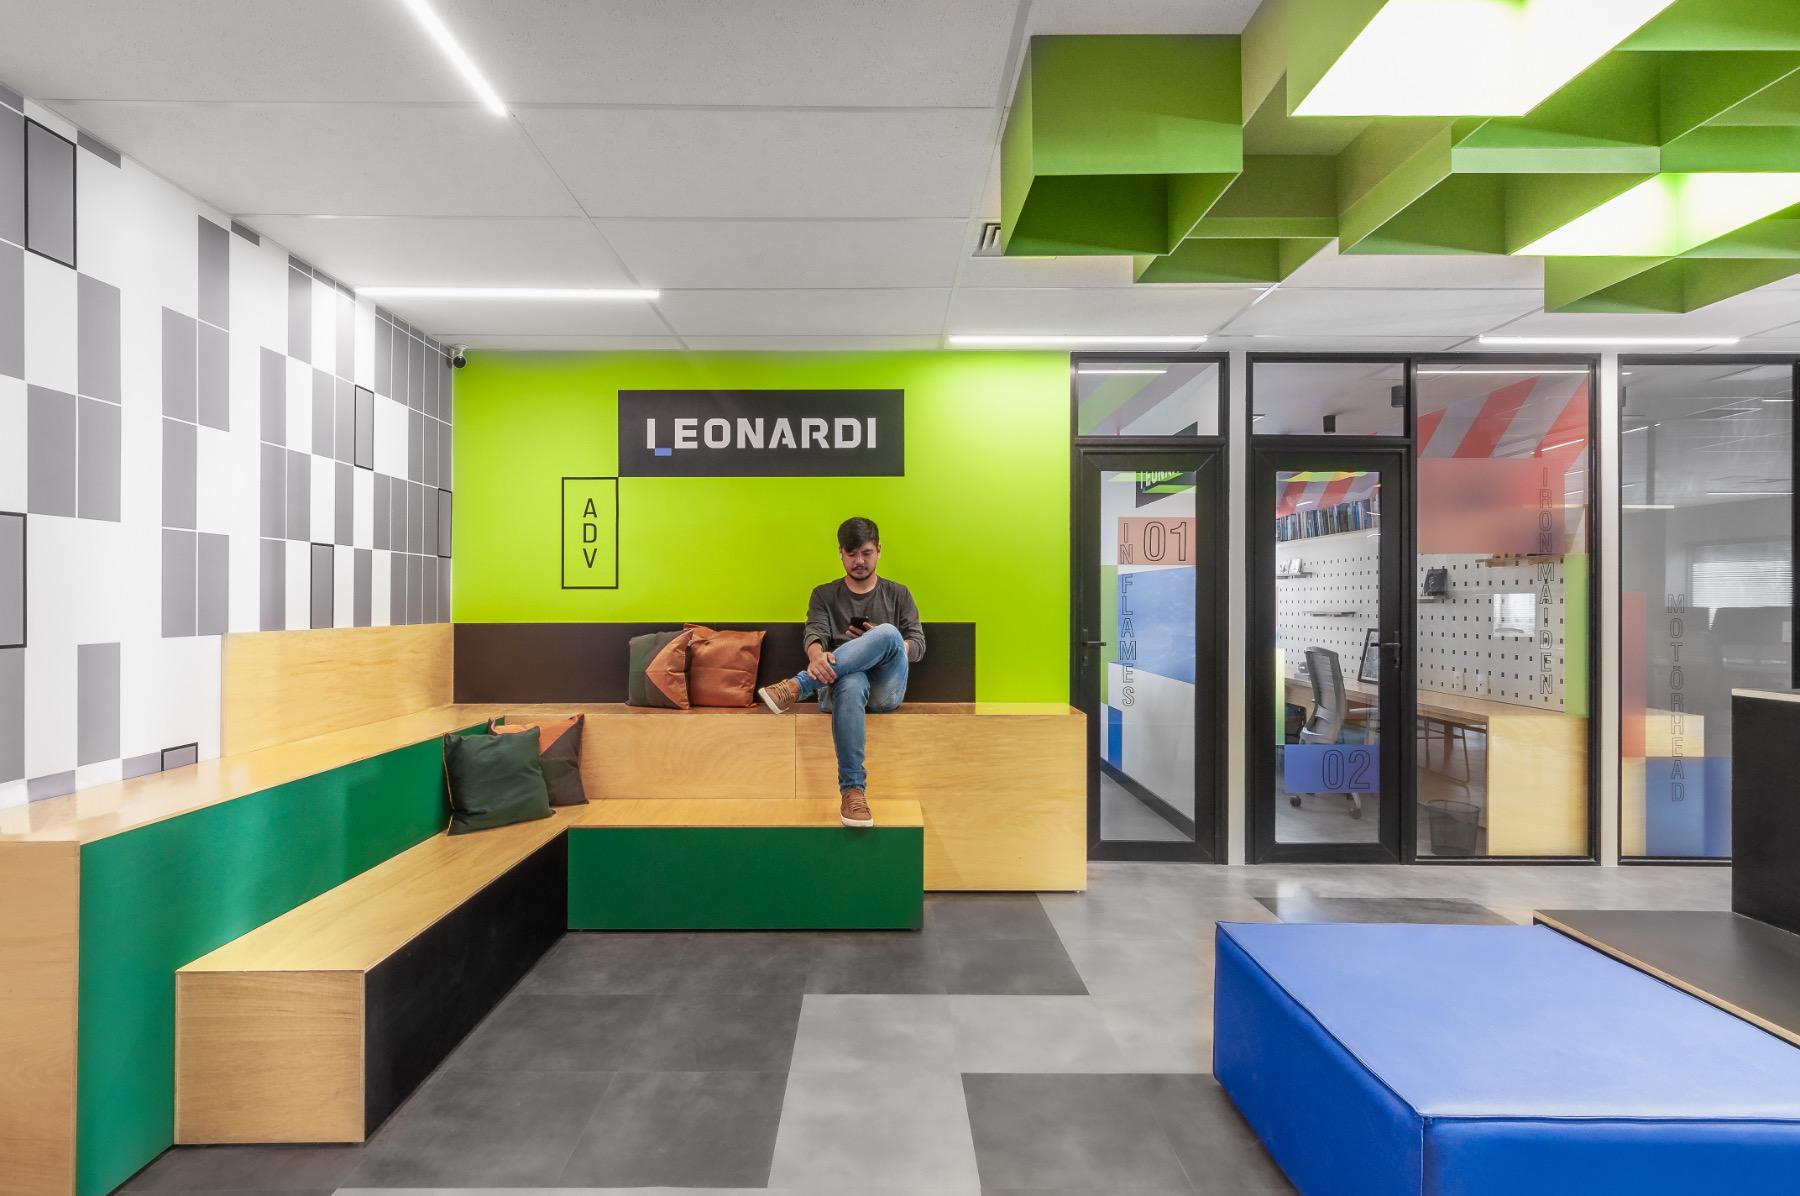 leonardi-advogados-sao-paulo-office-5